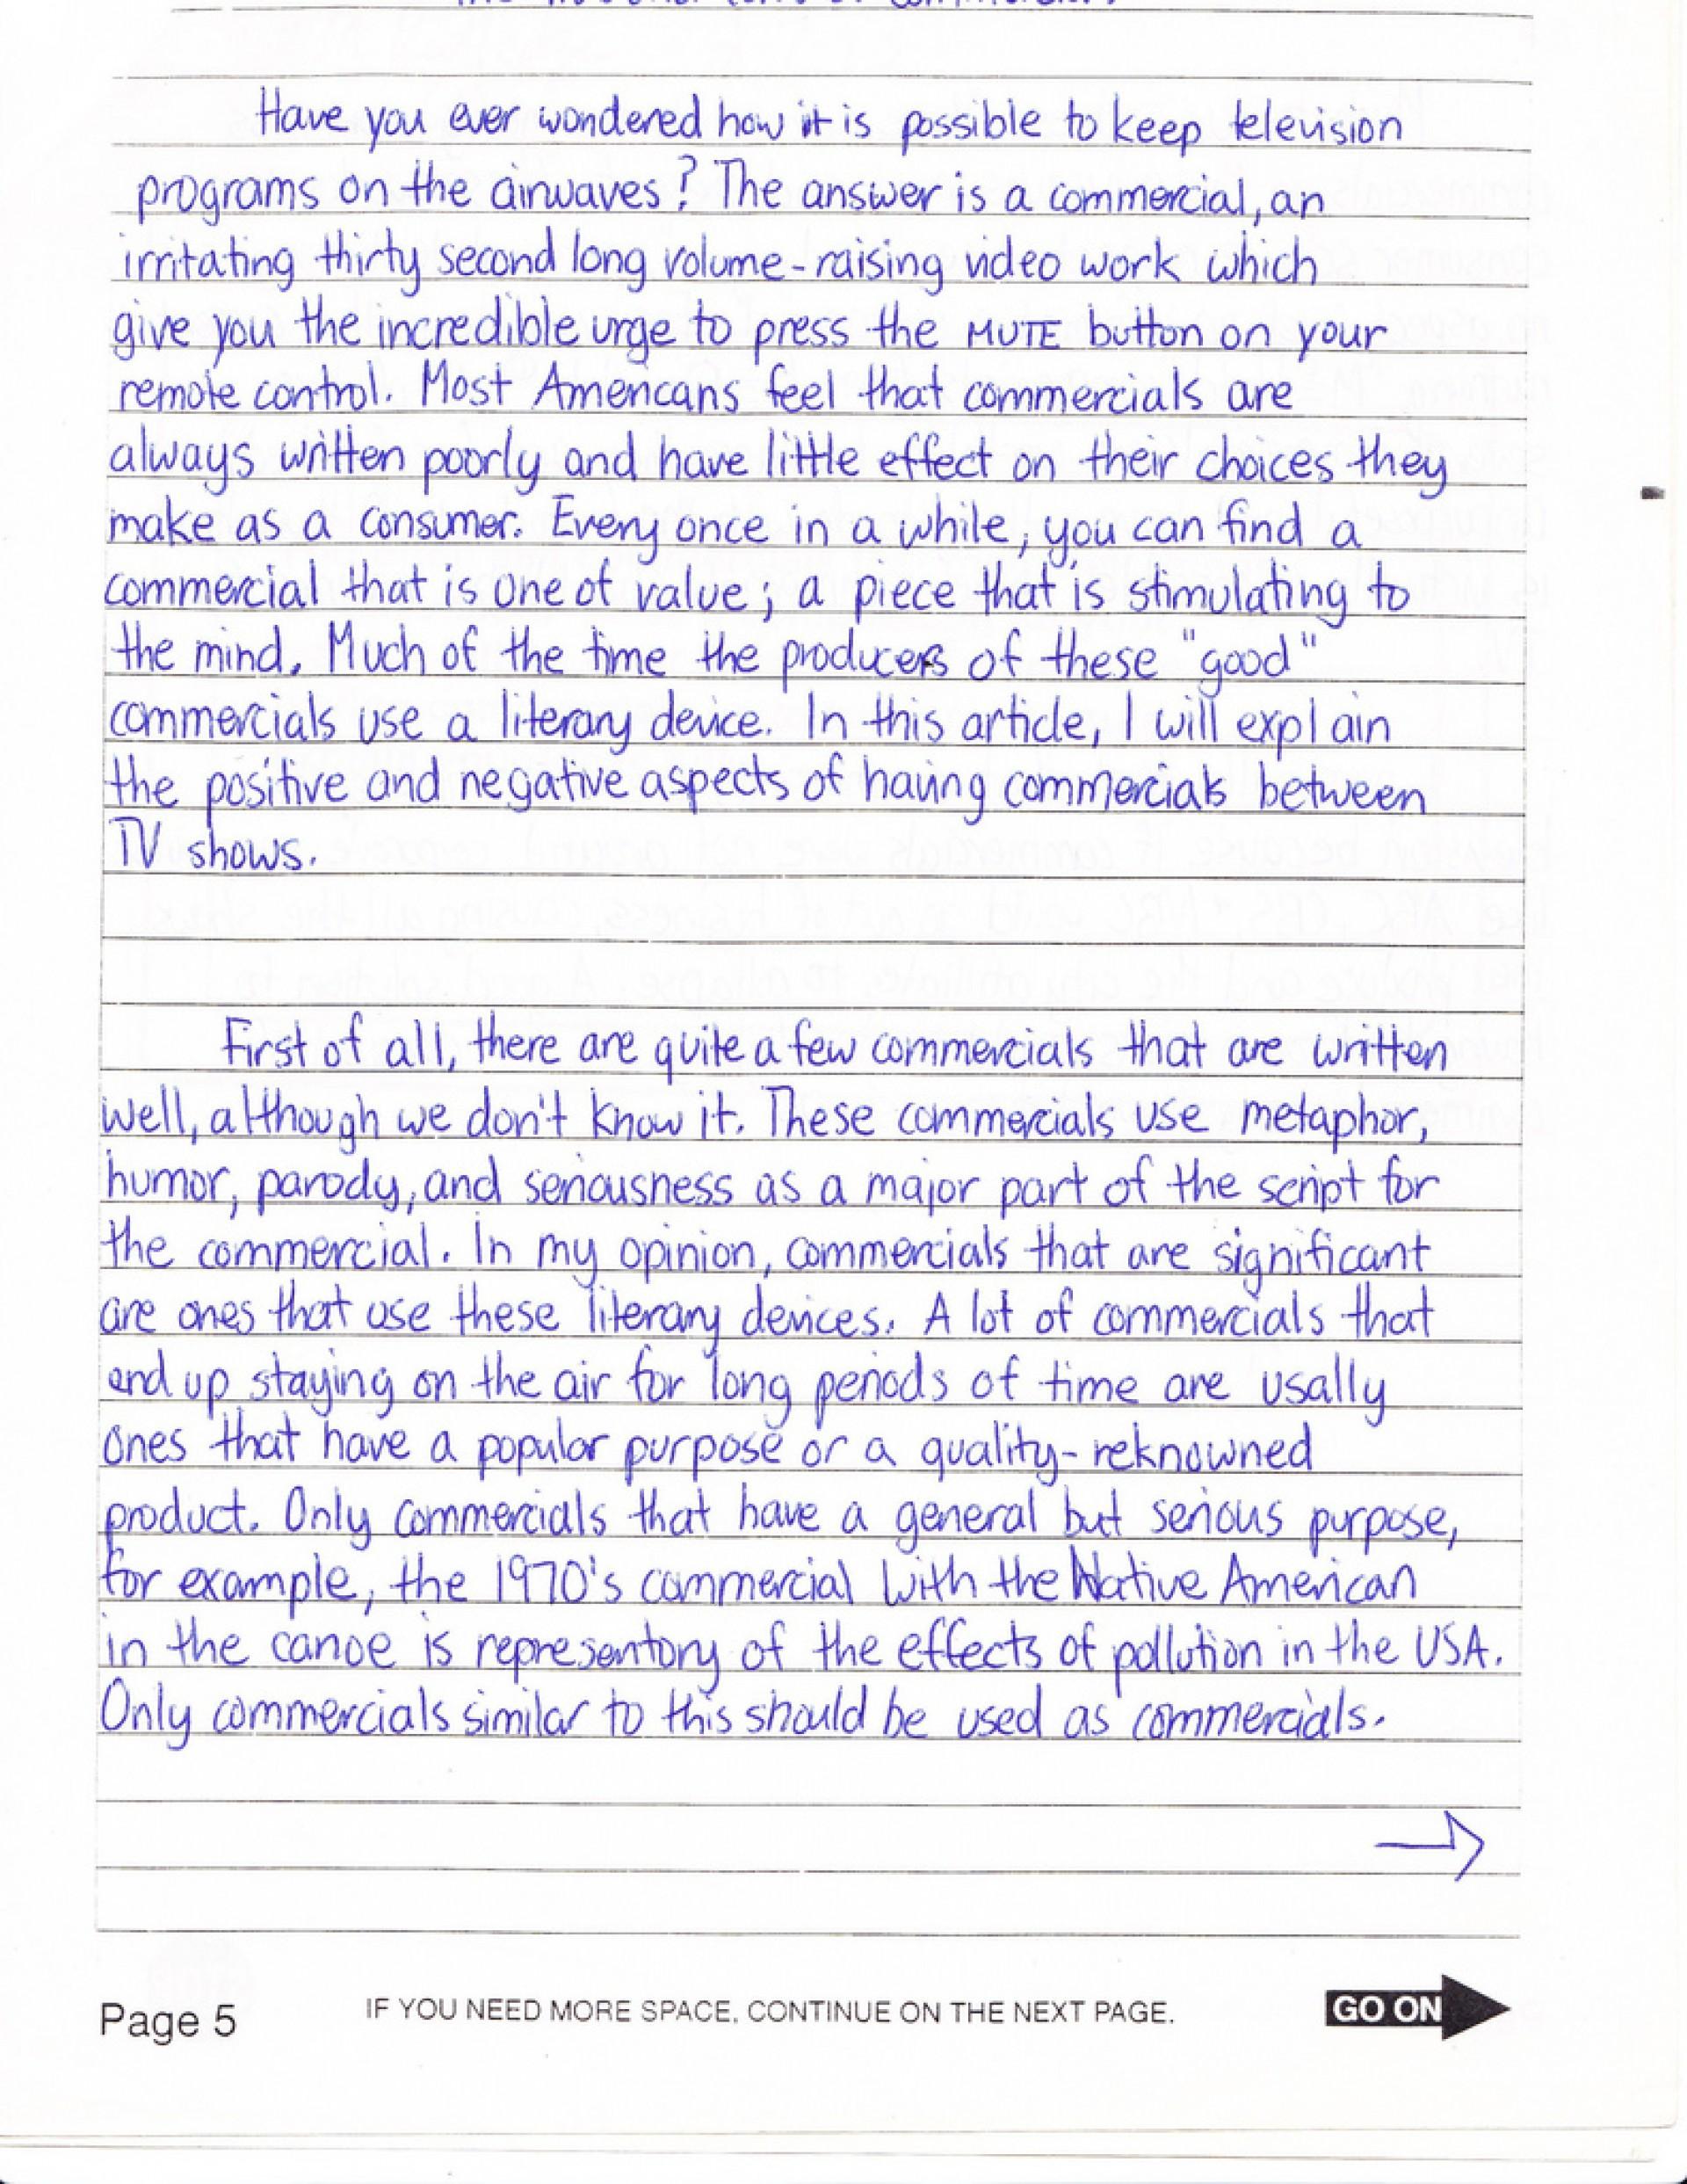 003 Essay Example Sat Average Score How To Write Imposing A Good Killer Pdf 1920